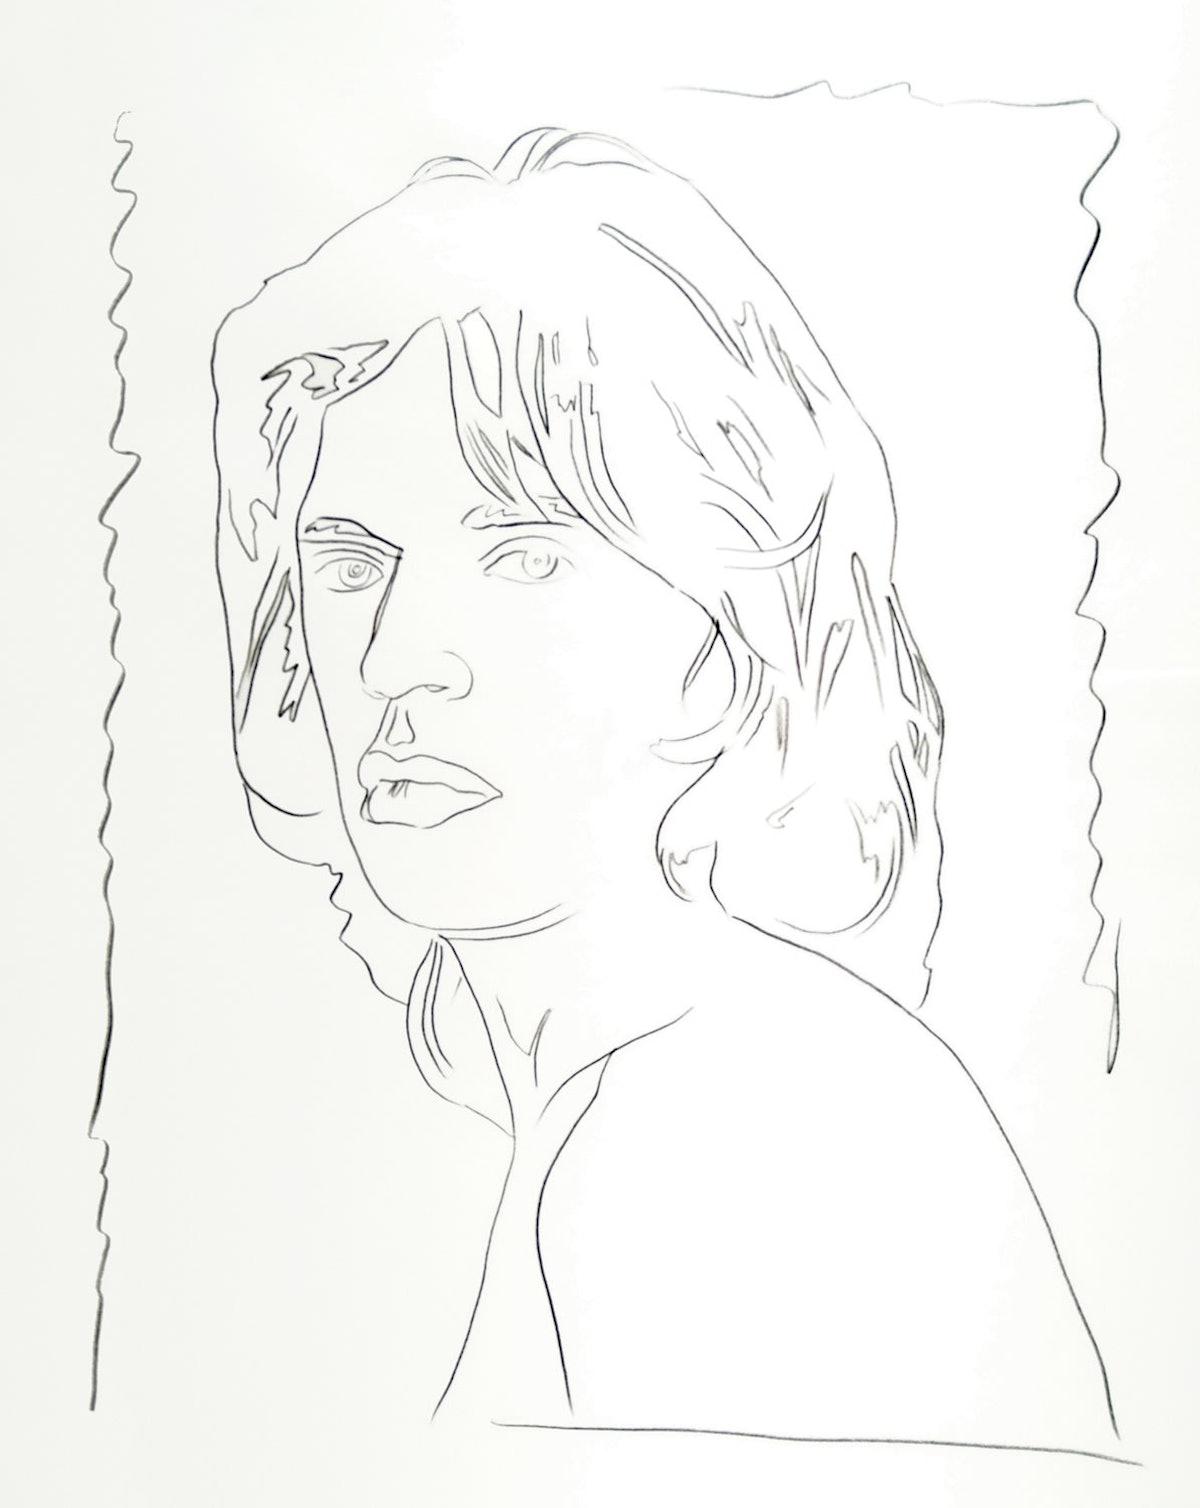 Warhol_Andy_MickJagger_pk12144.jpg